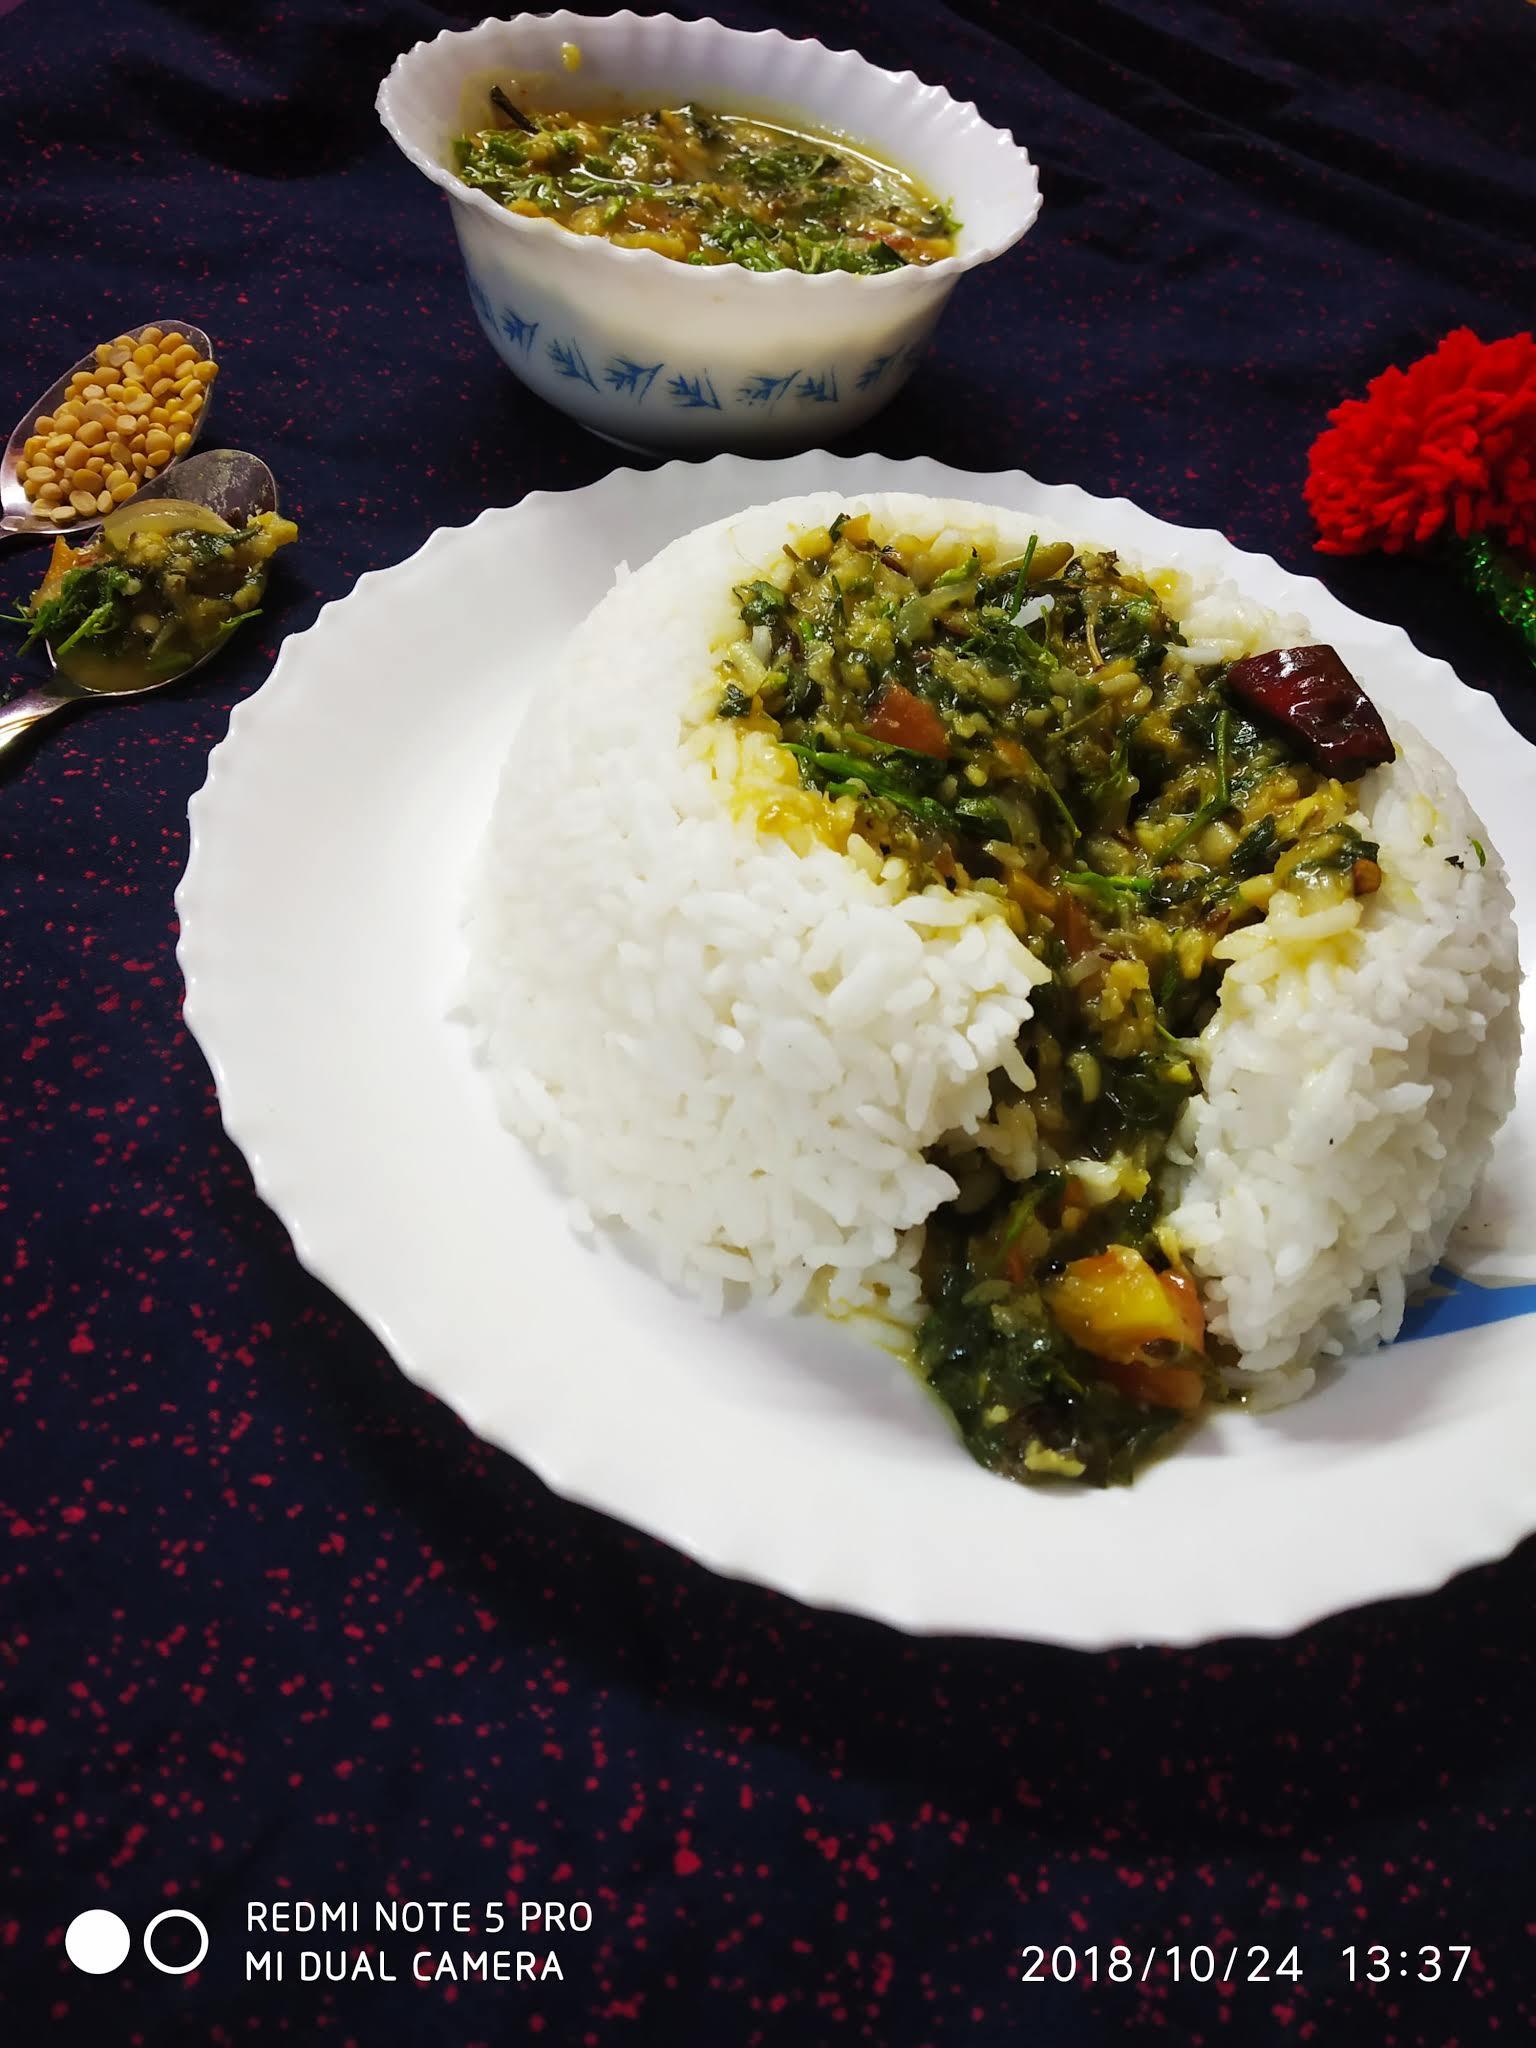 Moringa leaves kootu in a rice bowl